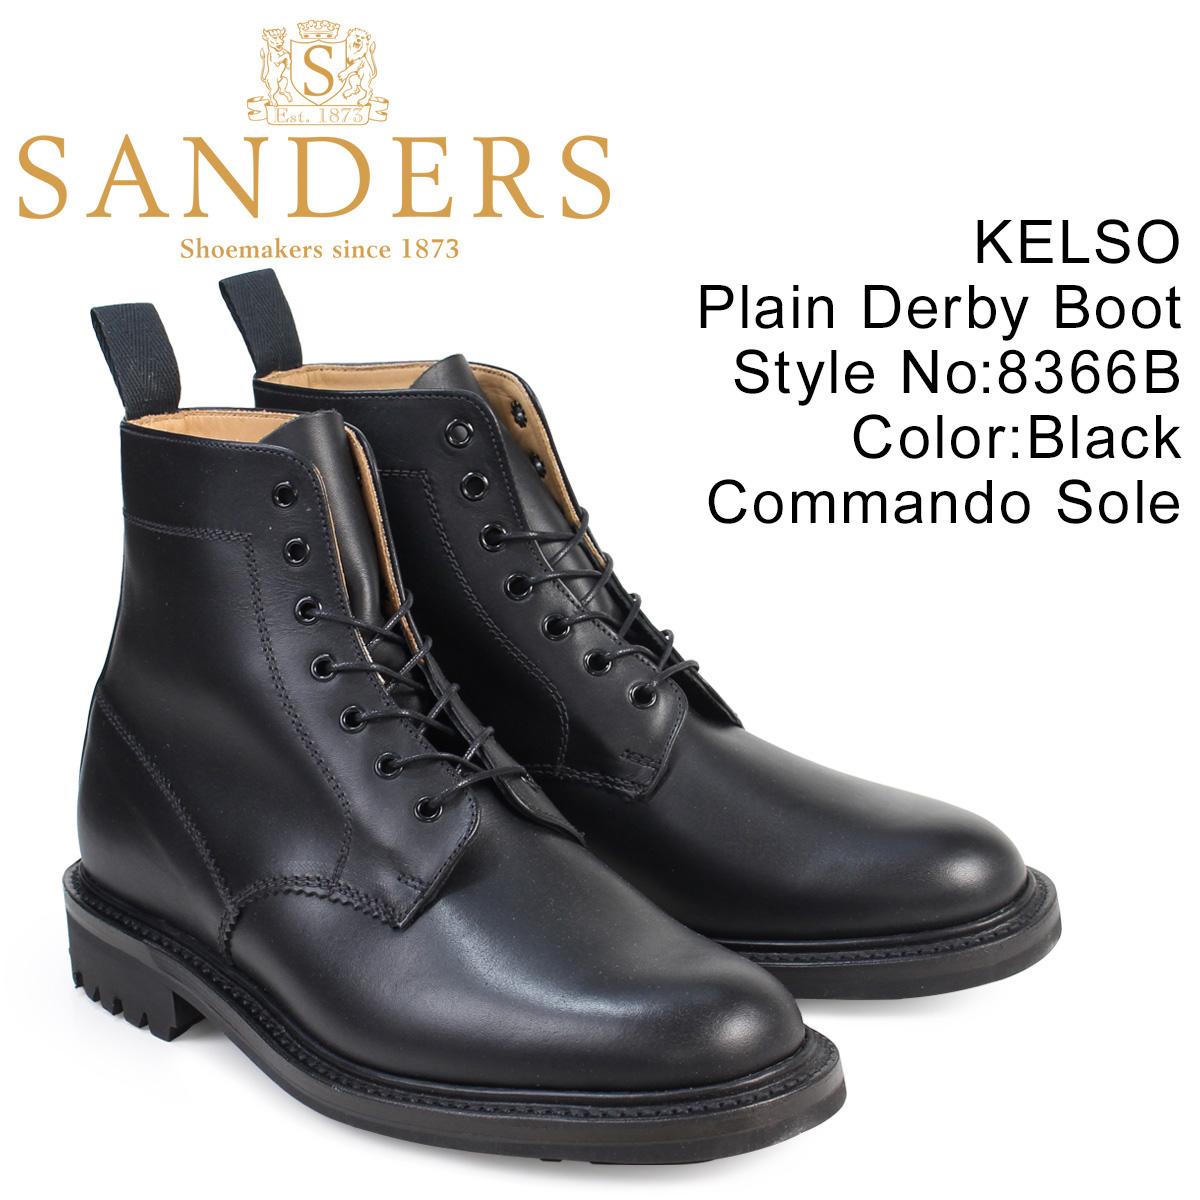 SANDERS 靴 サンダース ミリタリー ダービー ブーツ プレーントゥ KELSO 8366B メンズ ブラック